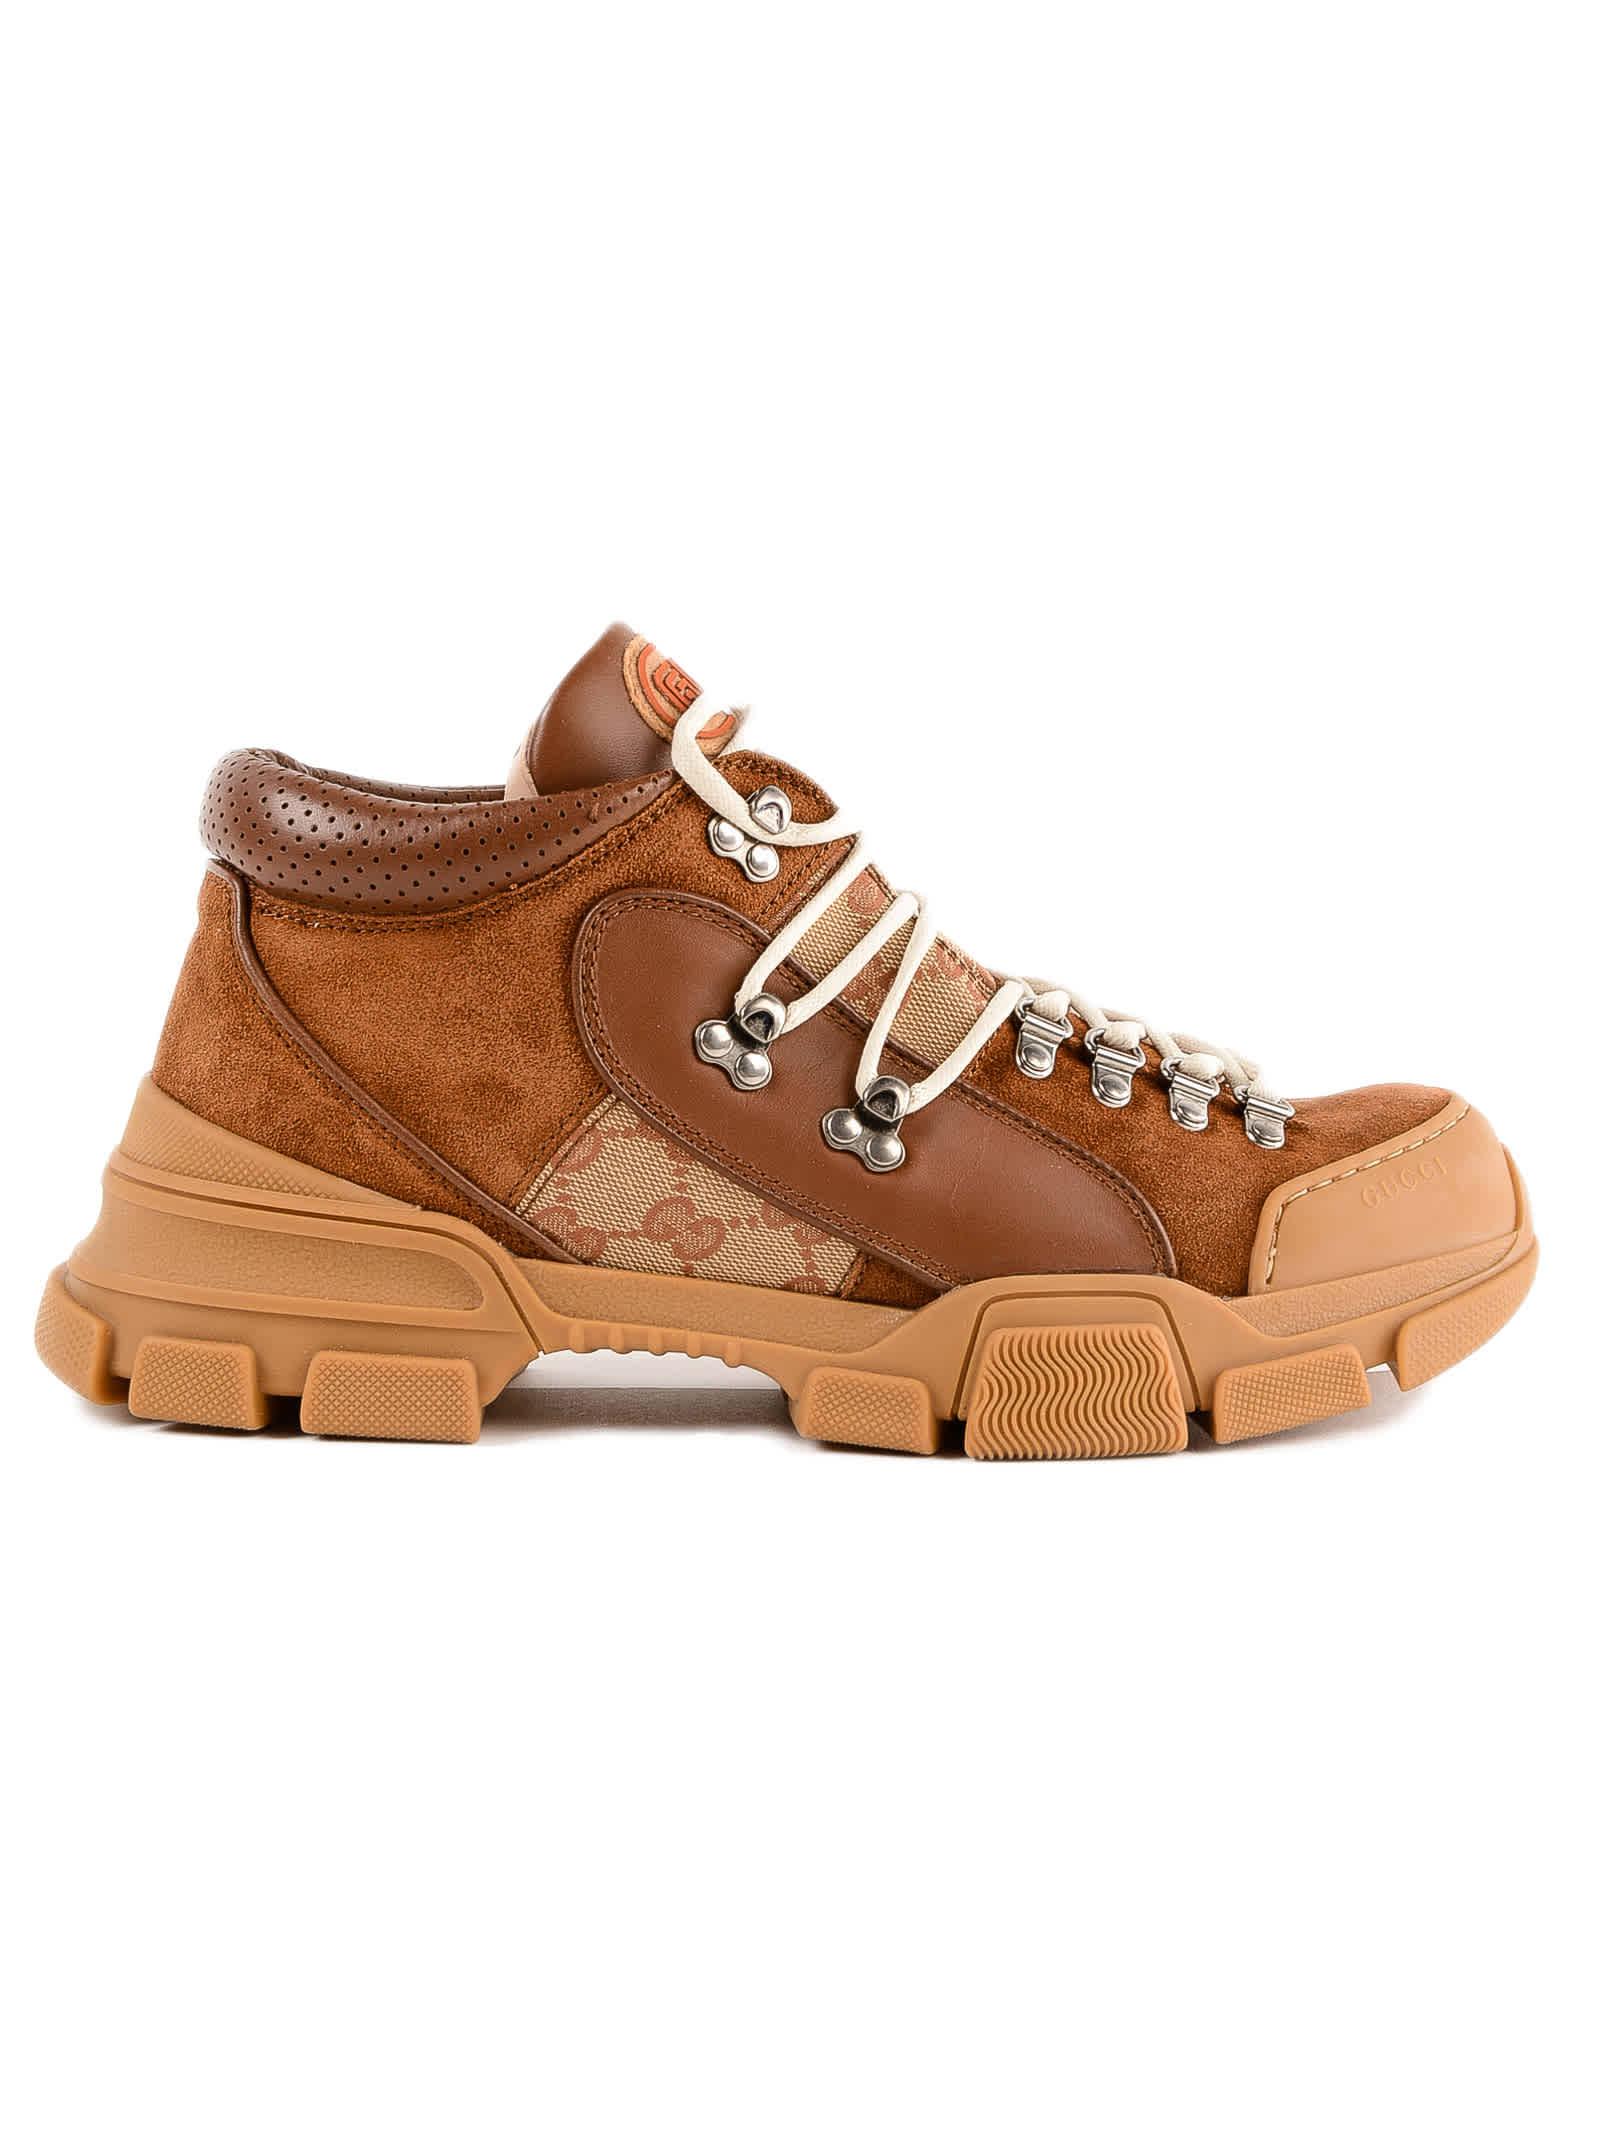 Gucci Flashtrek GG Low-Top Sneaker | eBay